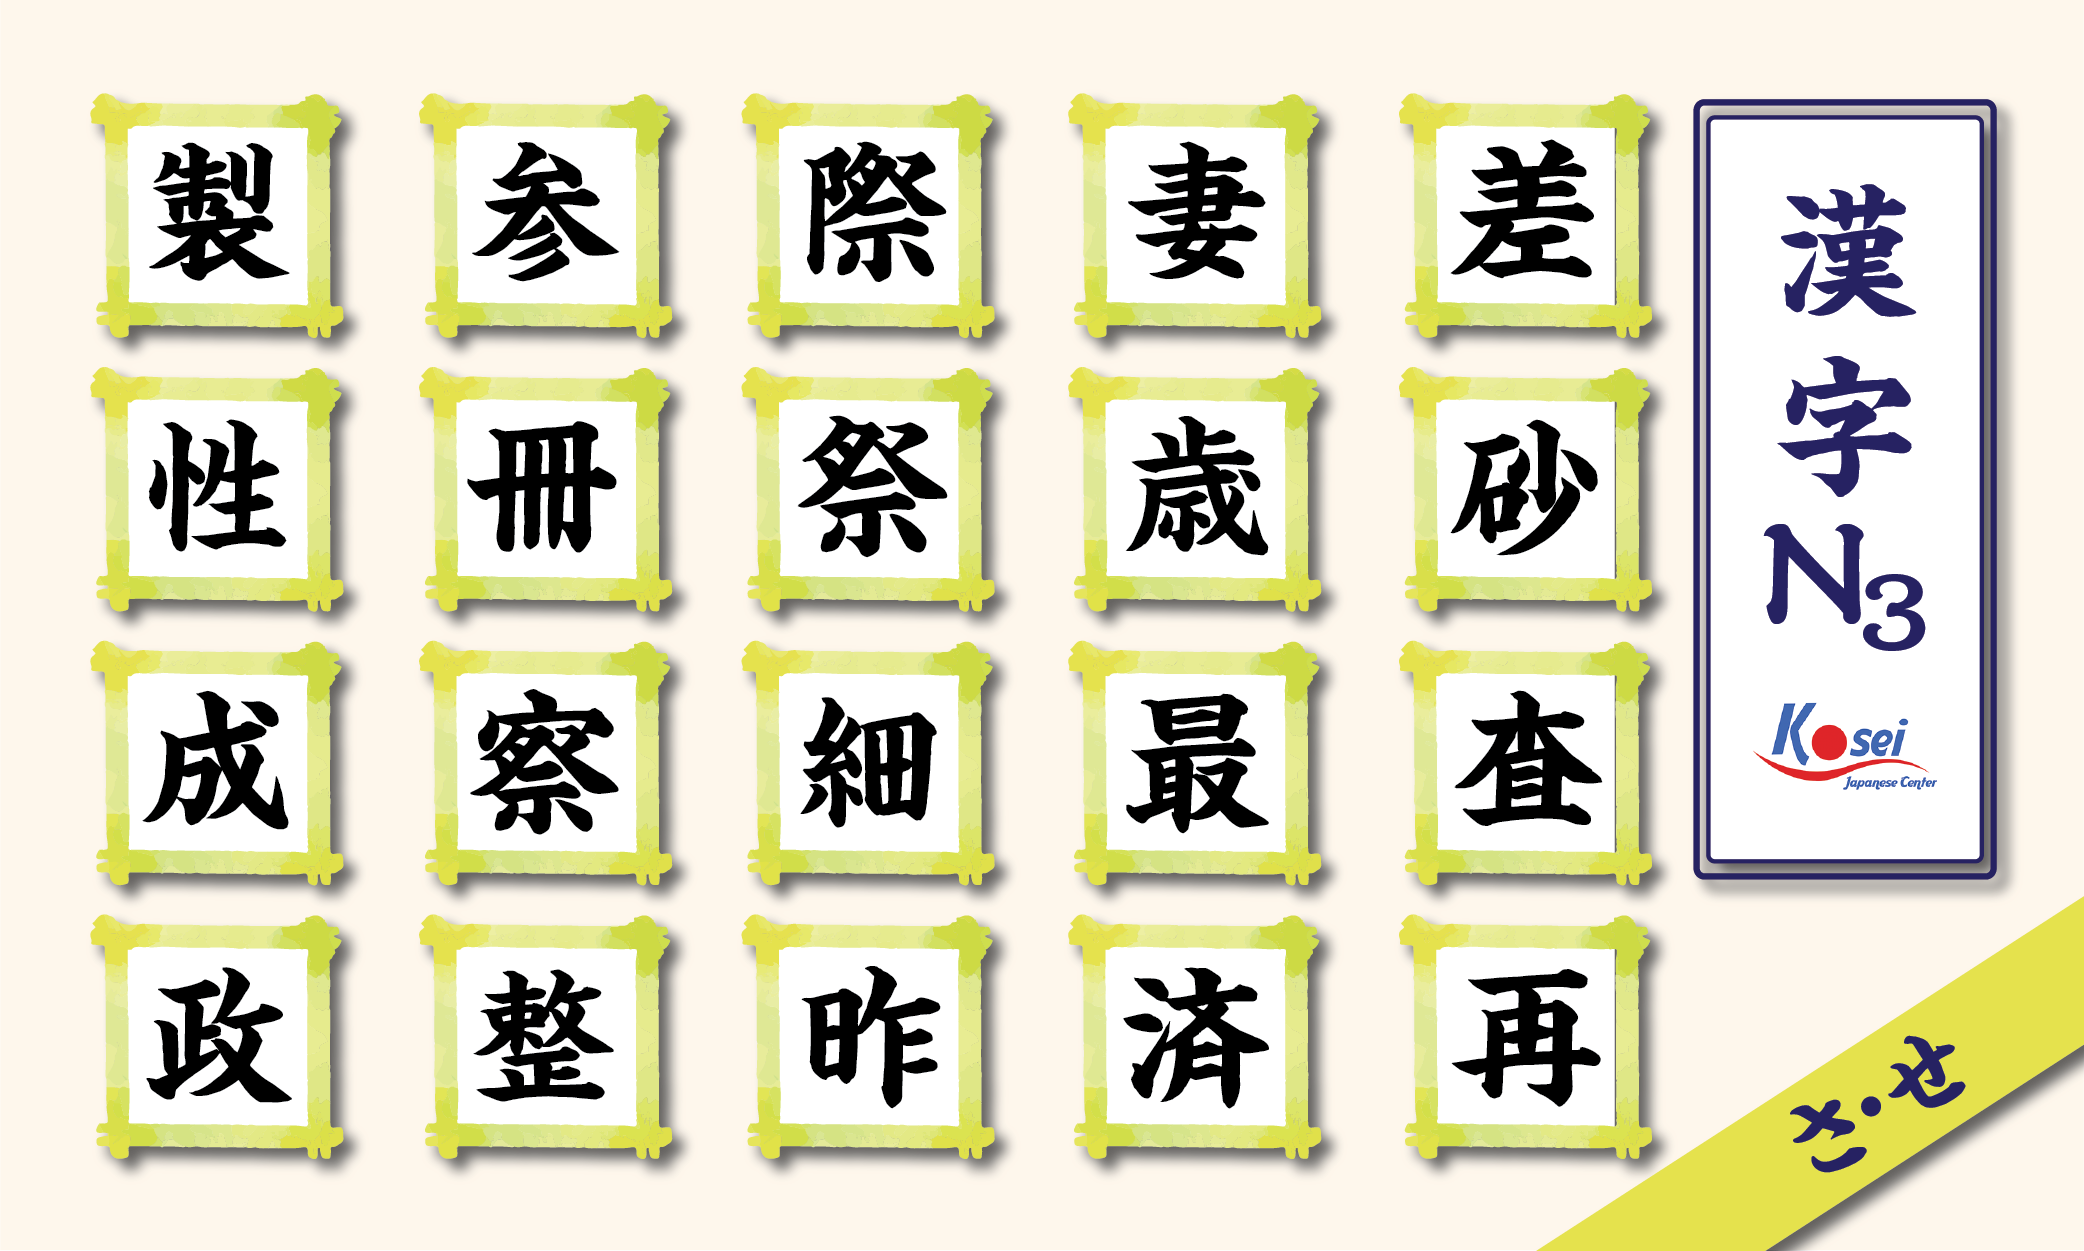 https://kosei.vn/tong-hop-kanji-n3-theo-am-on-hang-s-phan-1-n2243.html